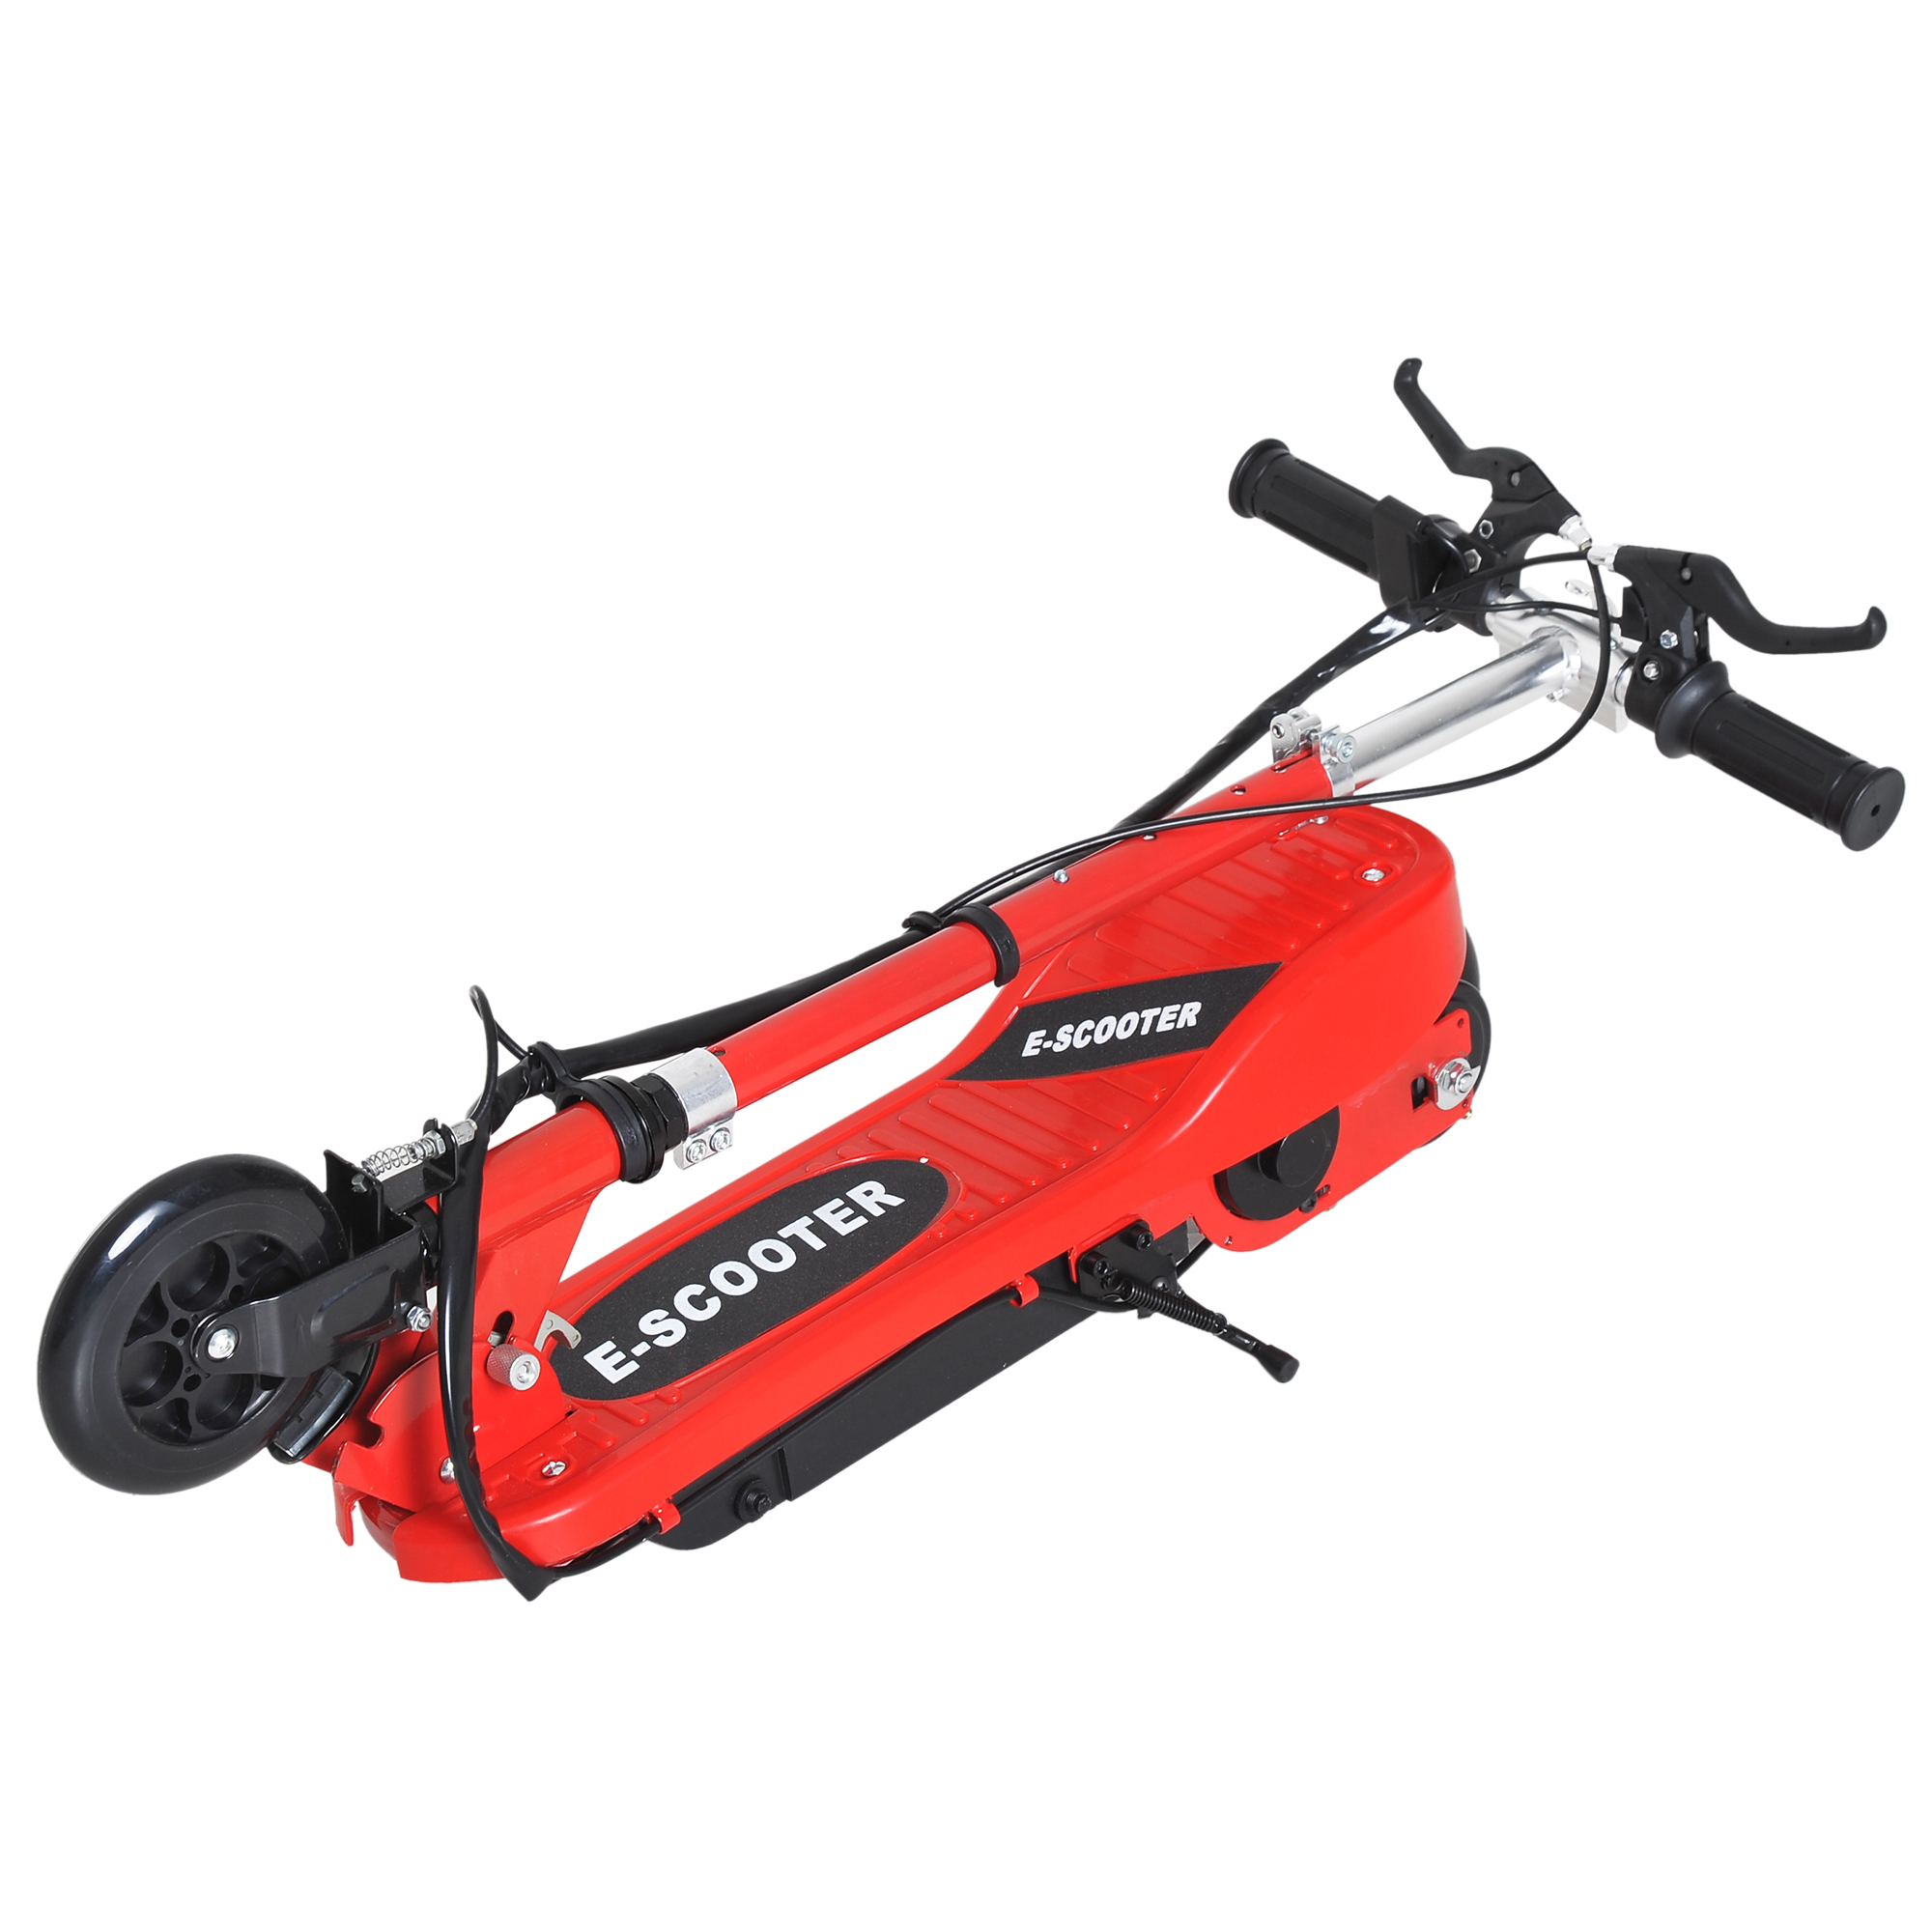 Elektroroller Elektroroller Elektroroller klappbar E-Scooter Cityroller höhenverstellbar 12 km/h 2 Farben 626c07